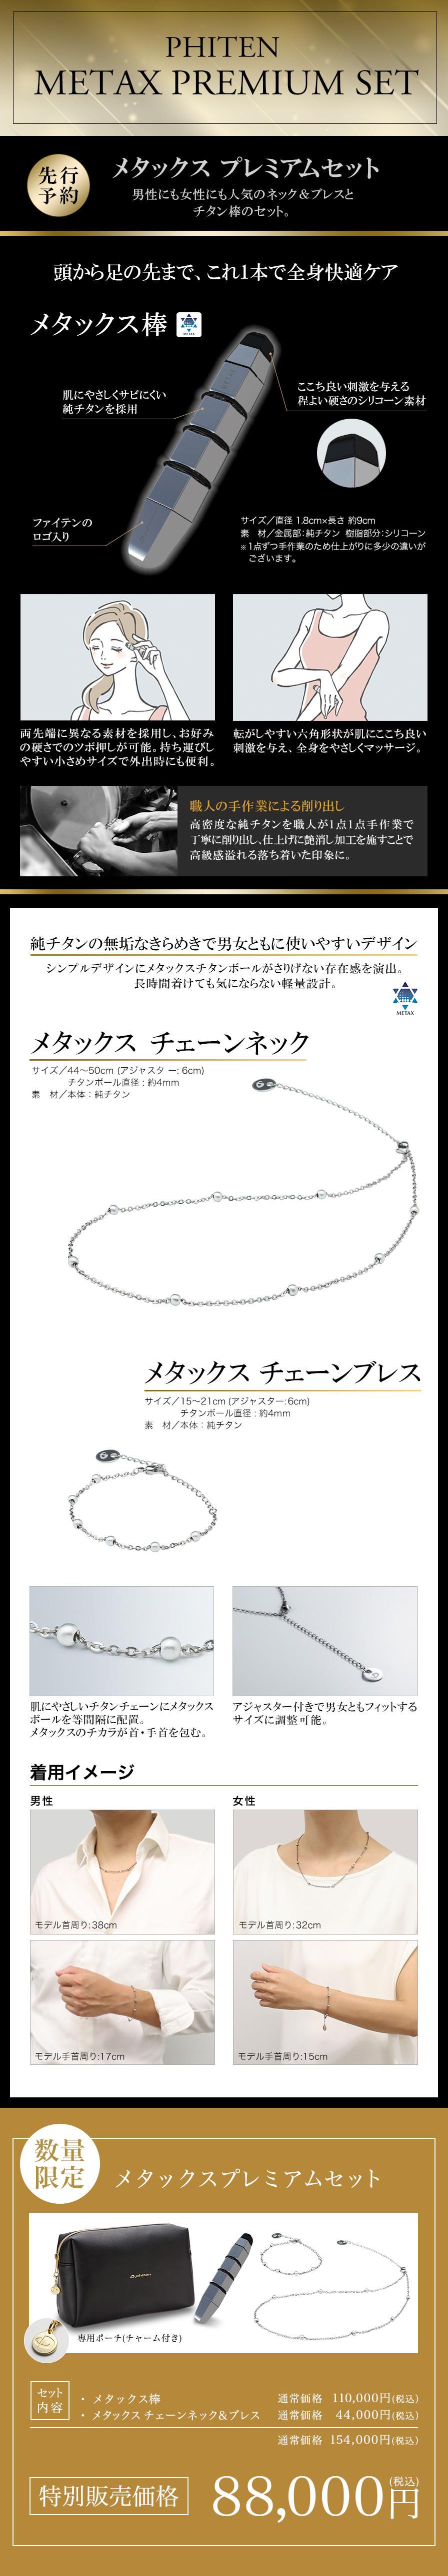 KOGAKUFUKUBUKURO2020a01.jpg